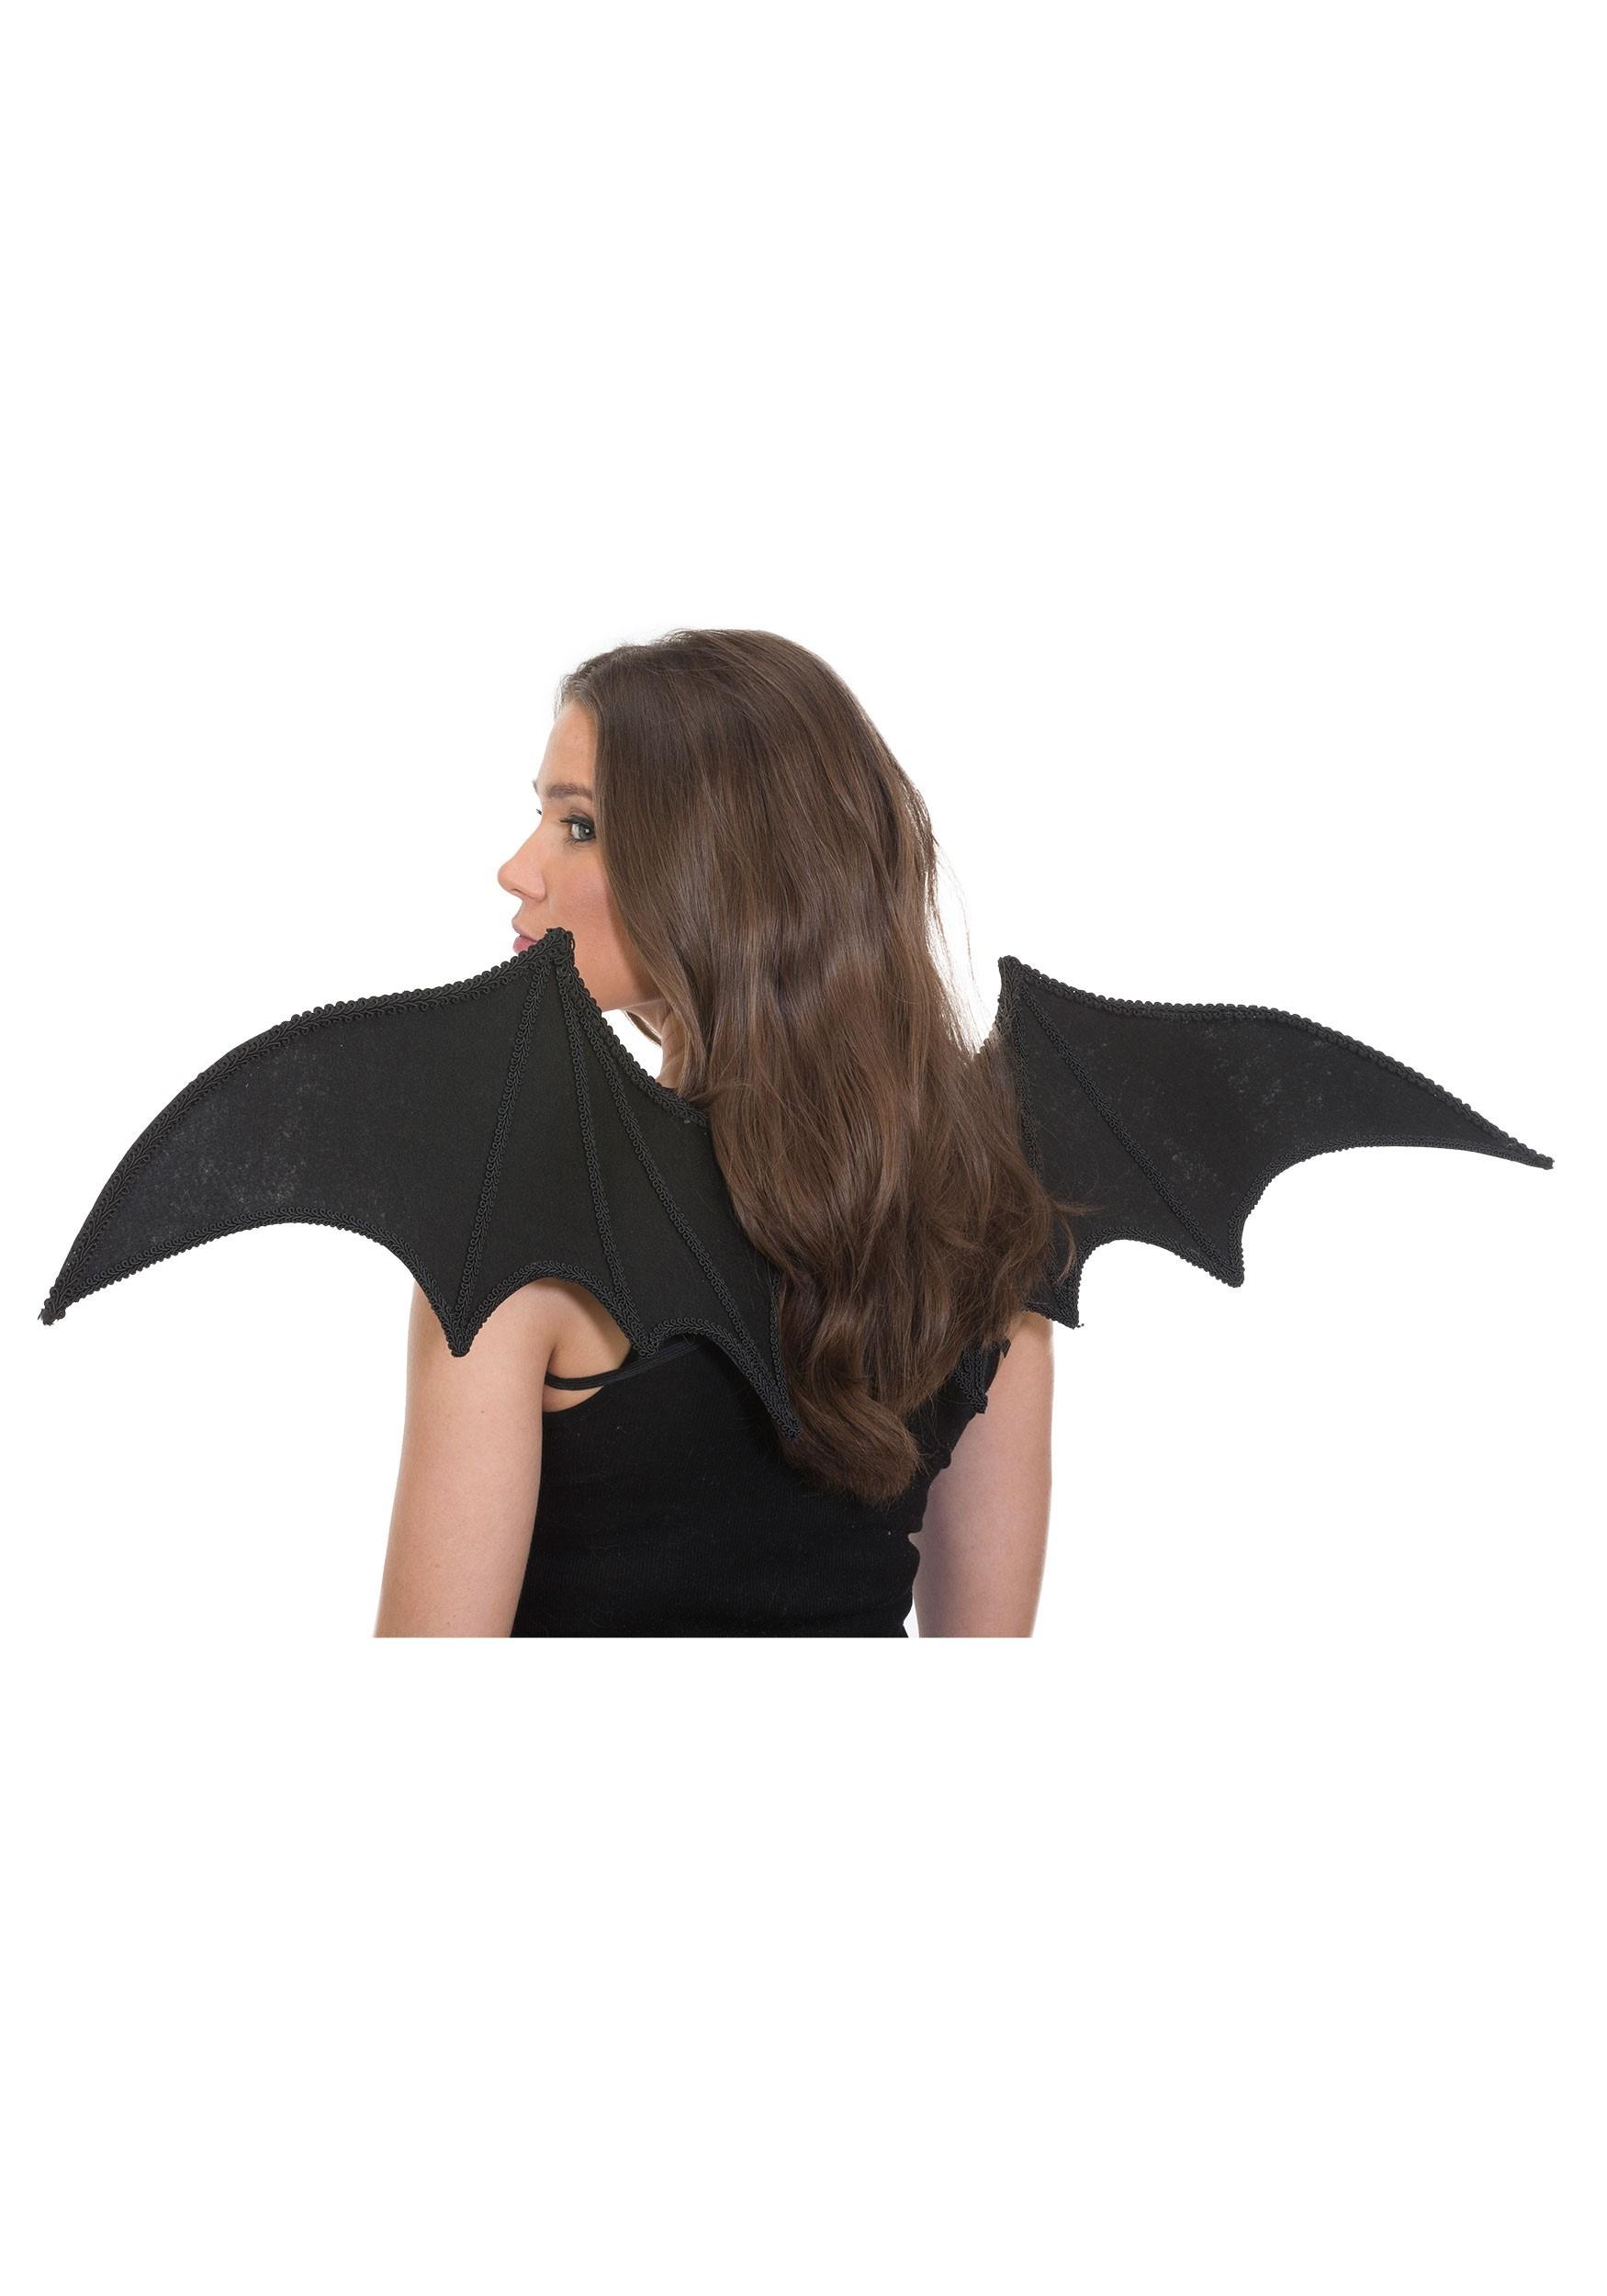 Pointy Black Bat Wings